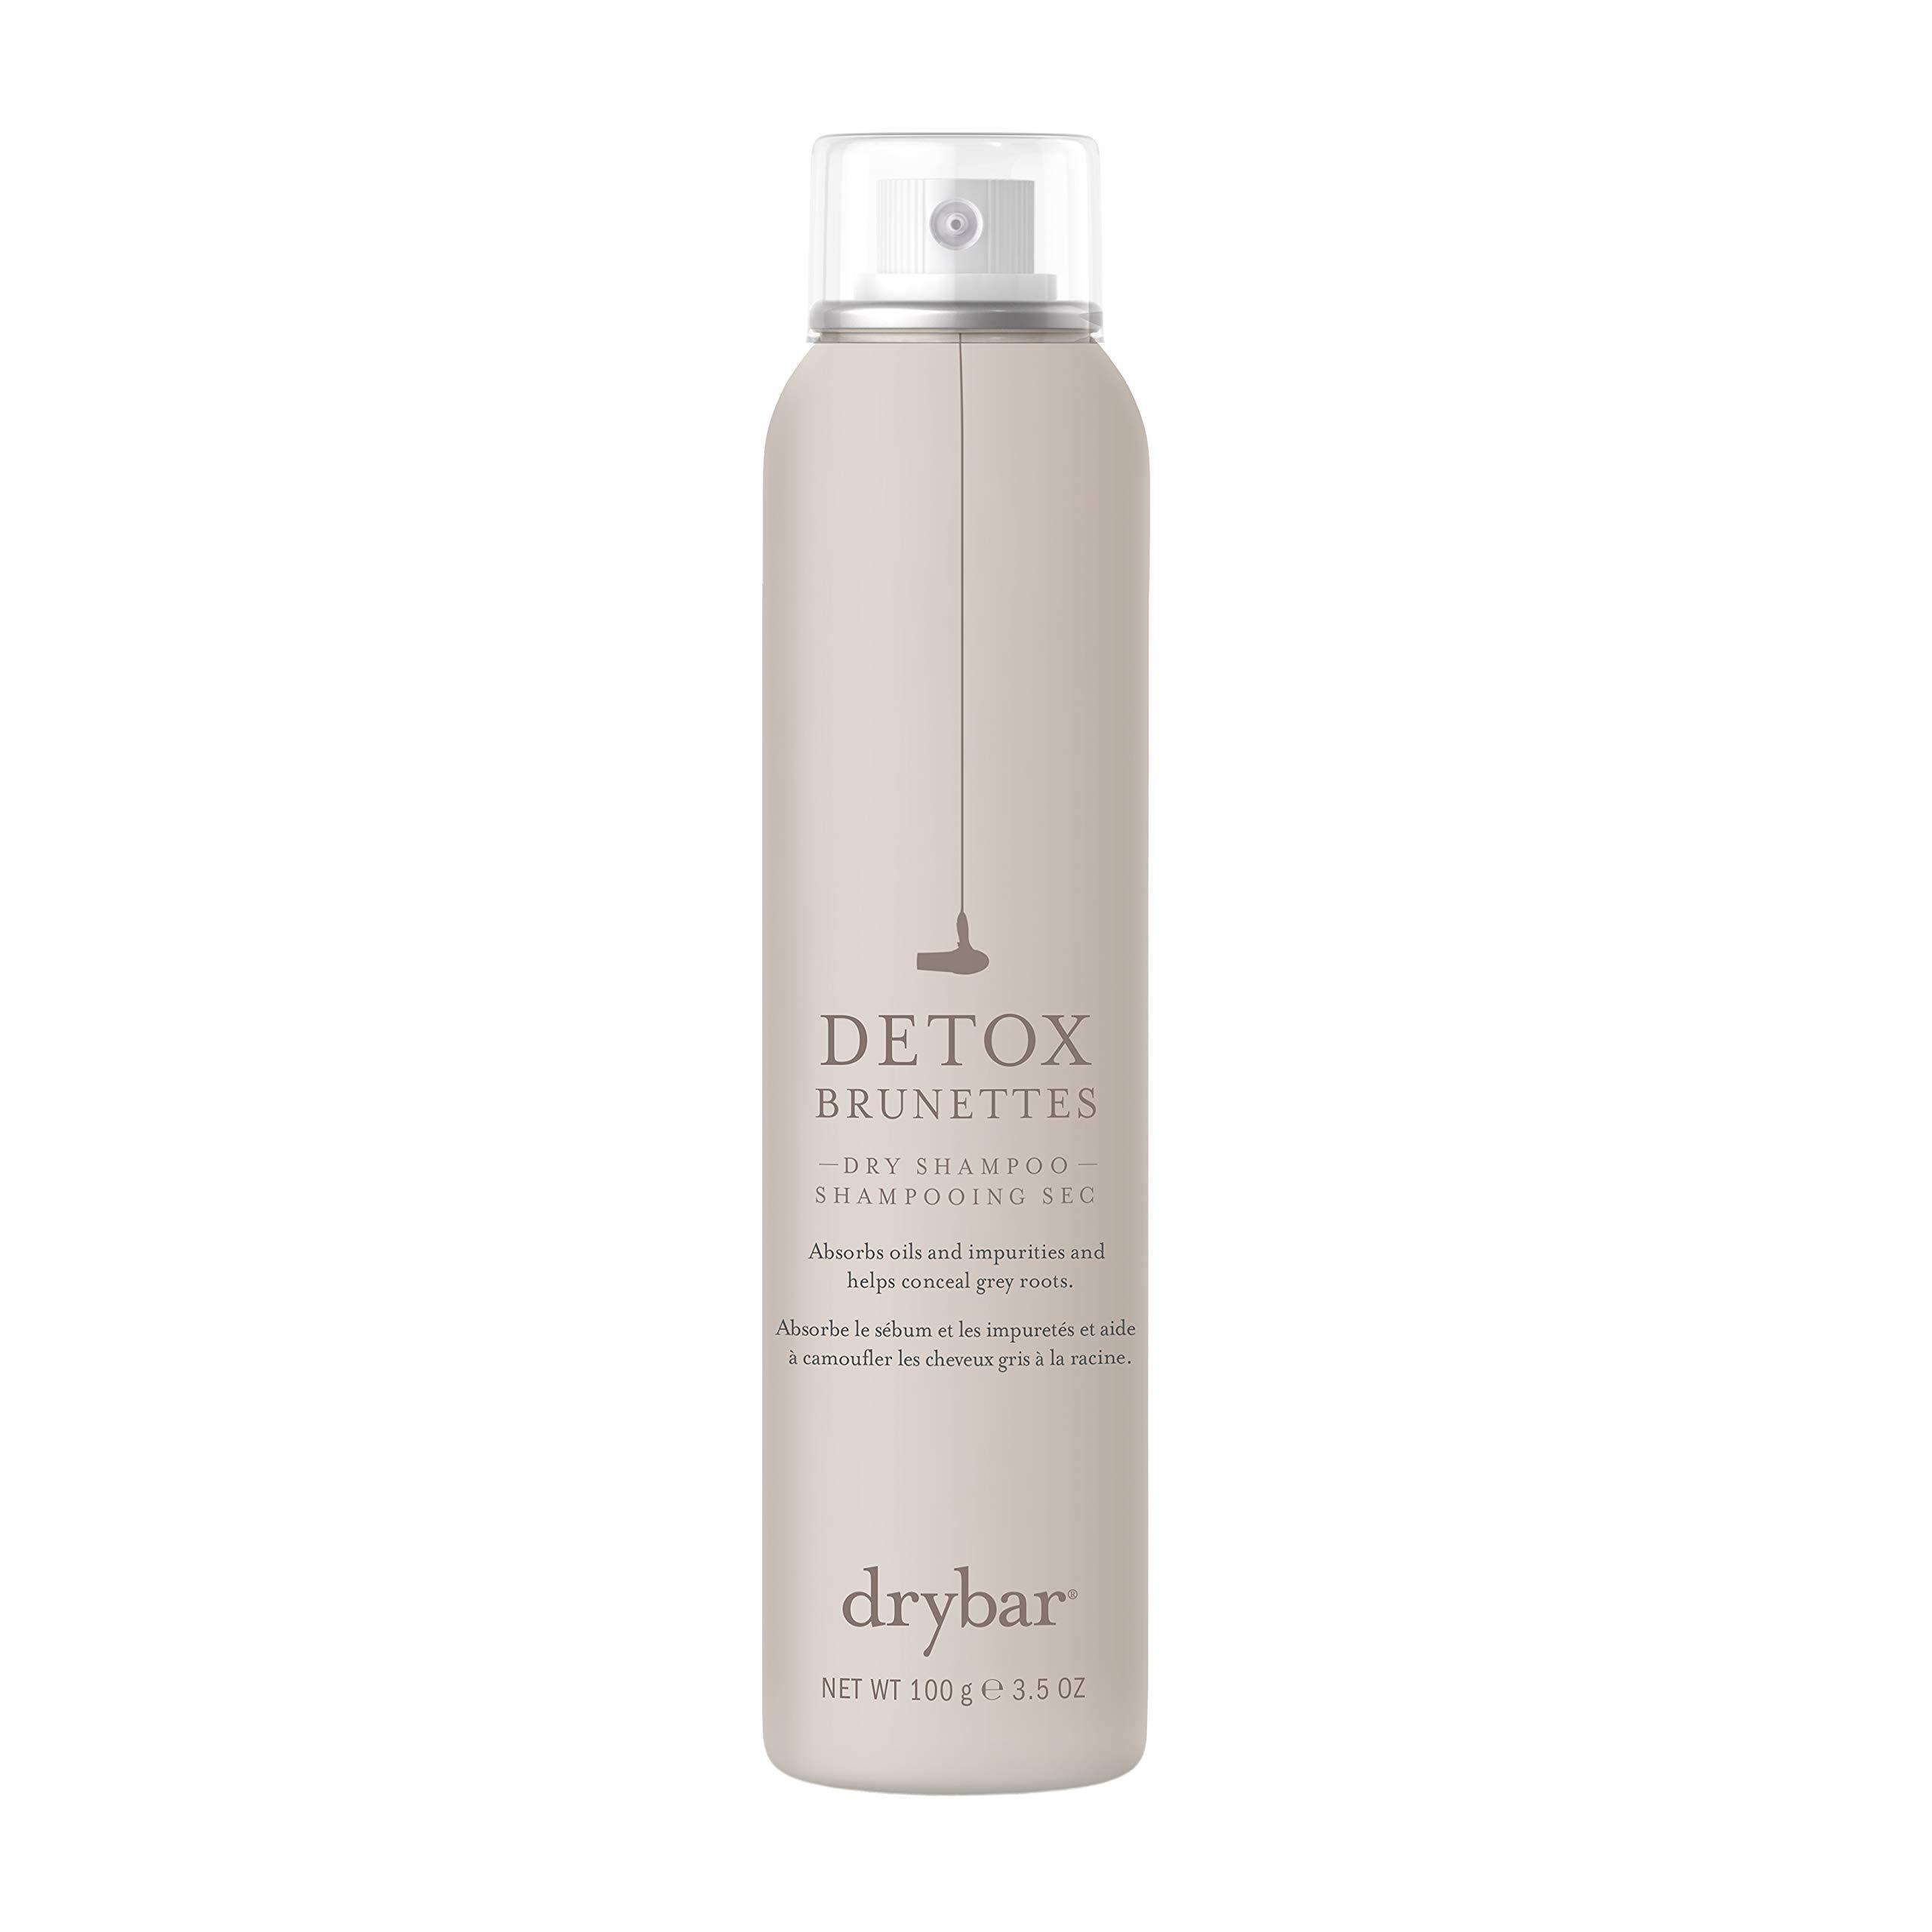 Drybar Detox Brunettes Dry Shampoo, 3.5 Ounces by Drybar